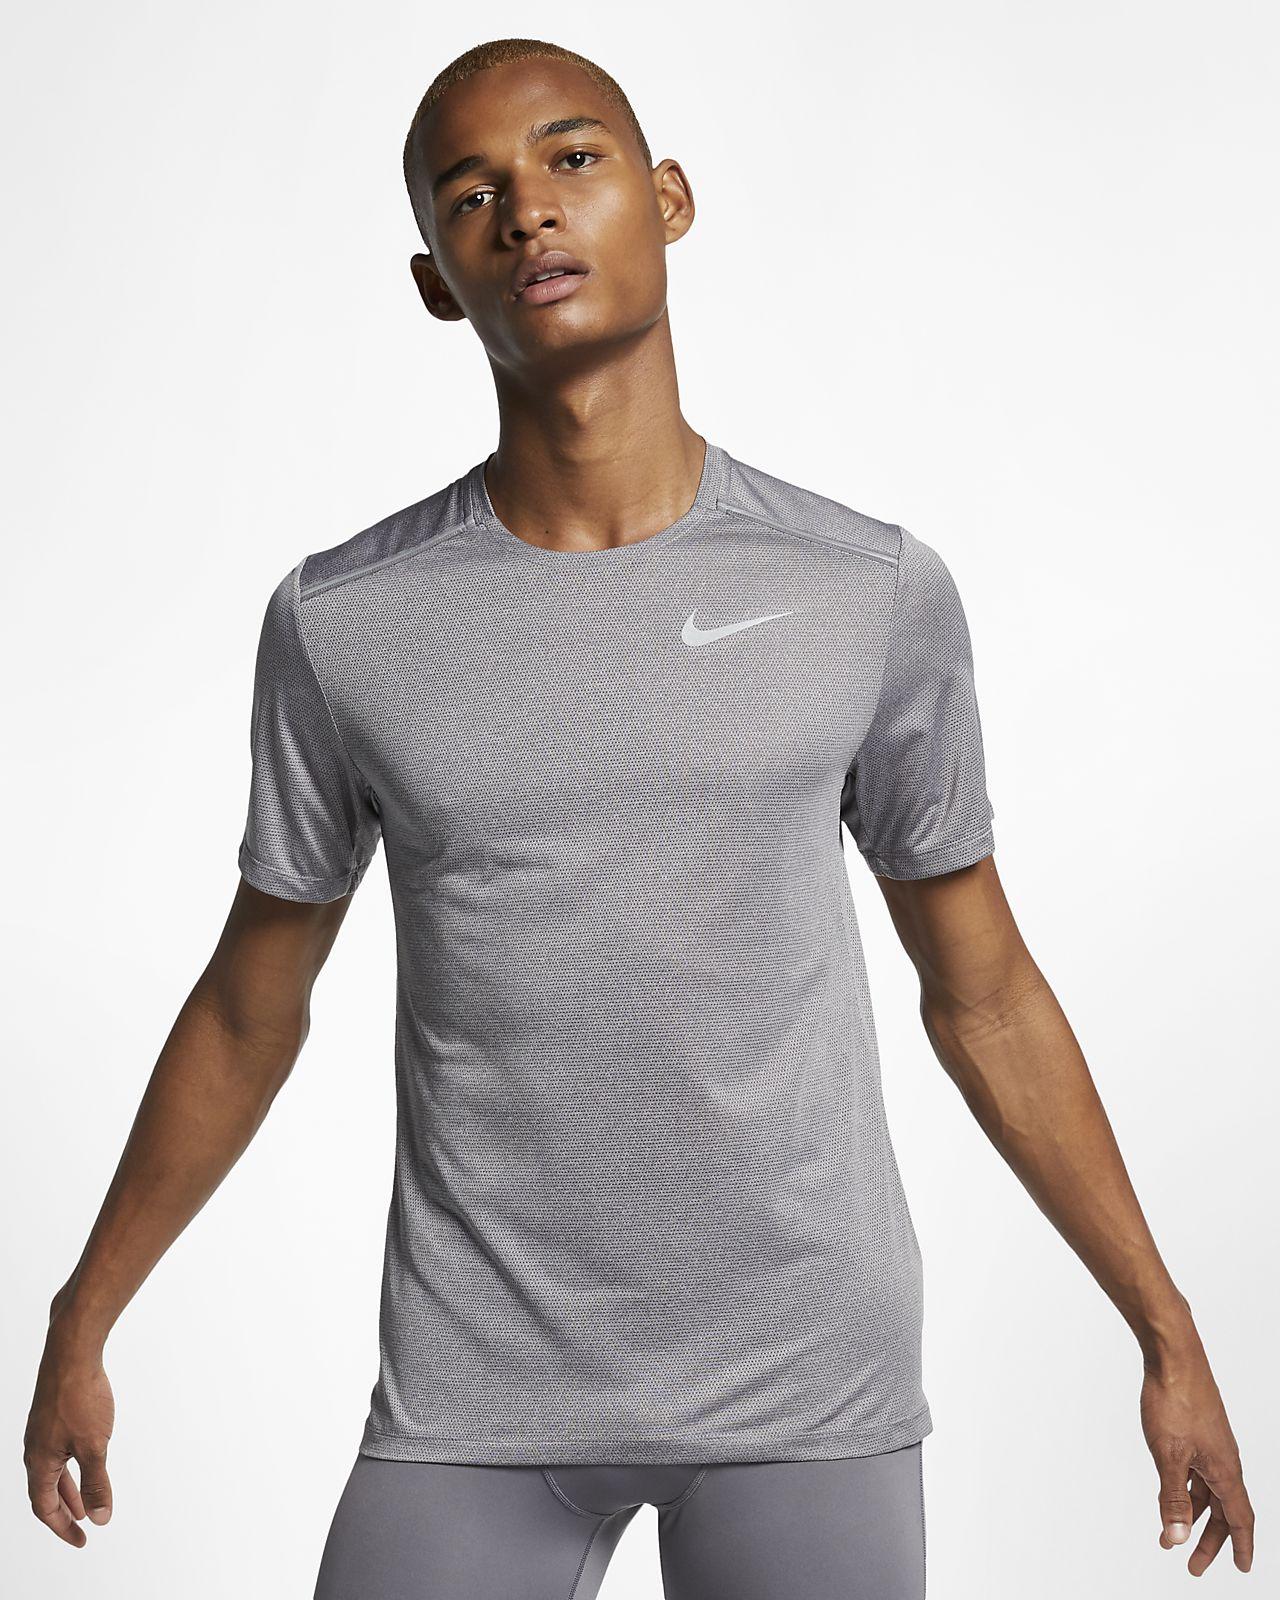 nike dri fit long sleeve running top, Nike Performance Cap